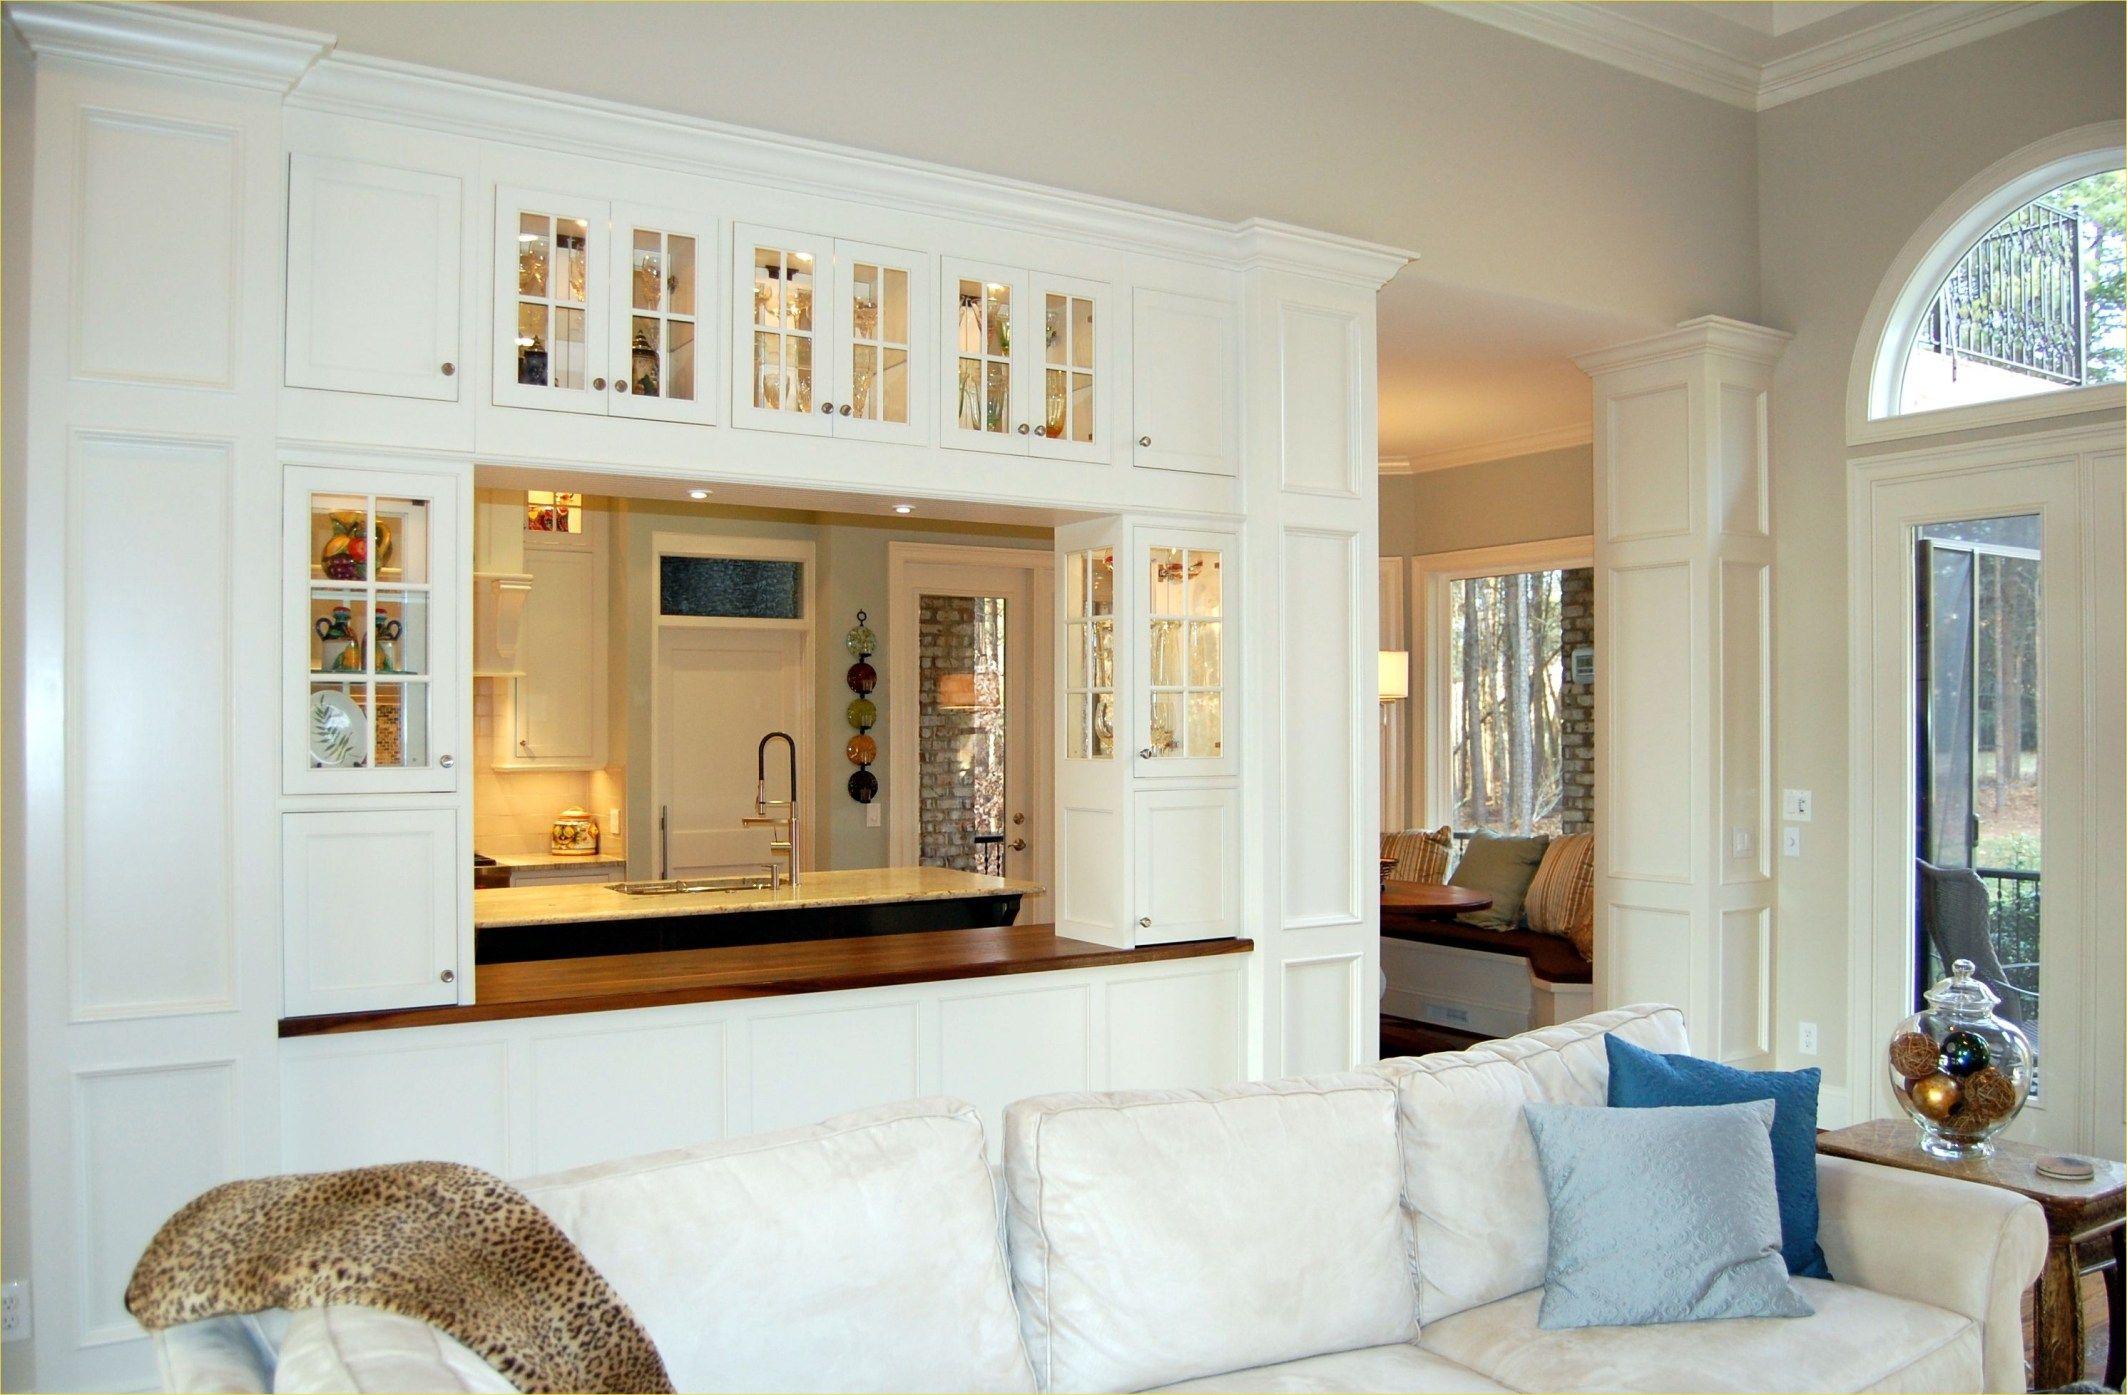 42 Modern Divide Kitchen From Living Room Ideas   Living ...